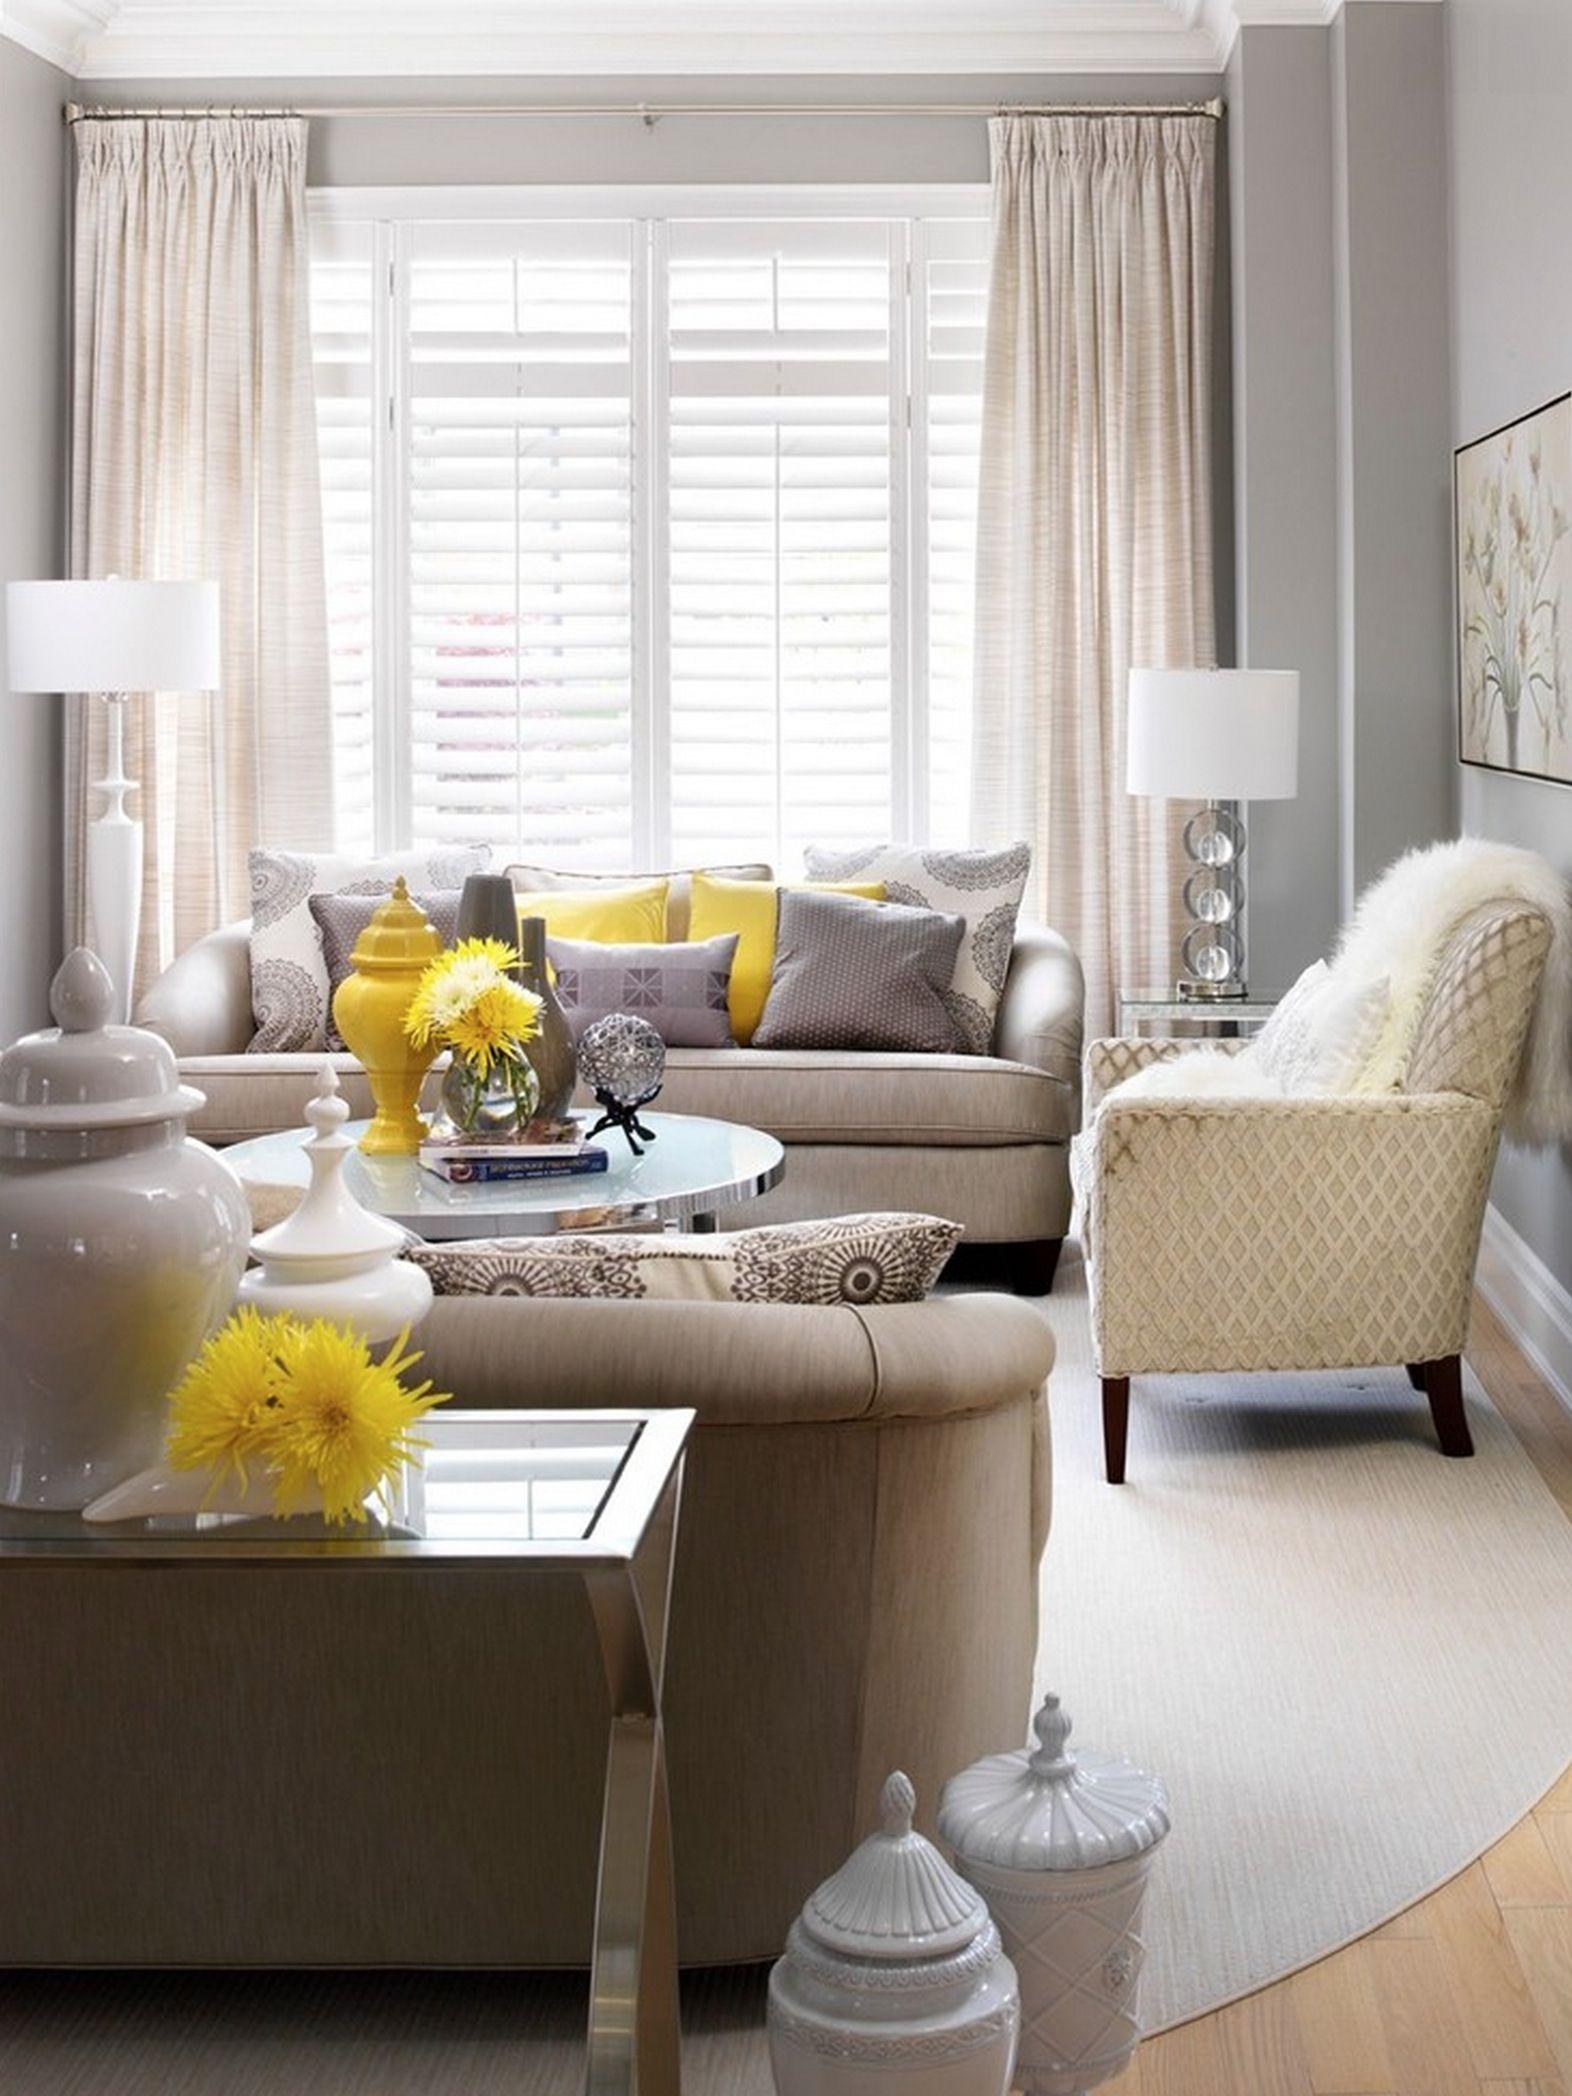 Living Room Design August 2014 70  Living Room  Pinterest Captivating Living Room Design Ideas 2014 Decorating Design